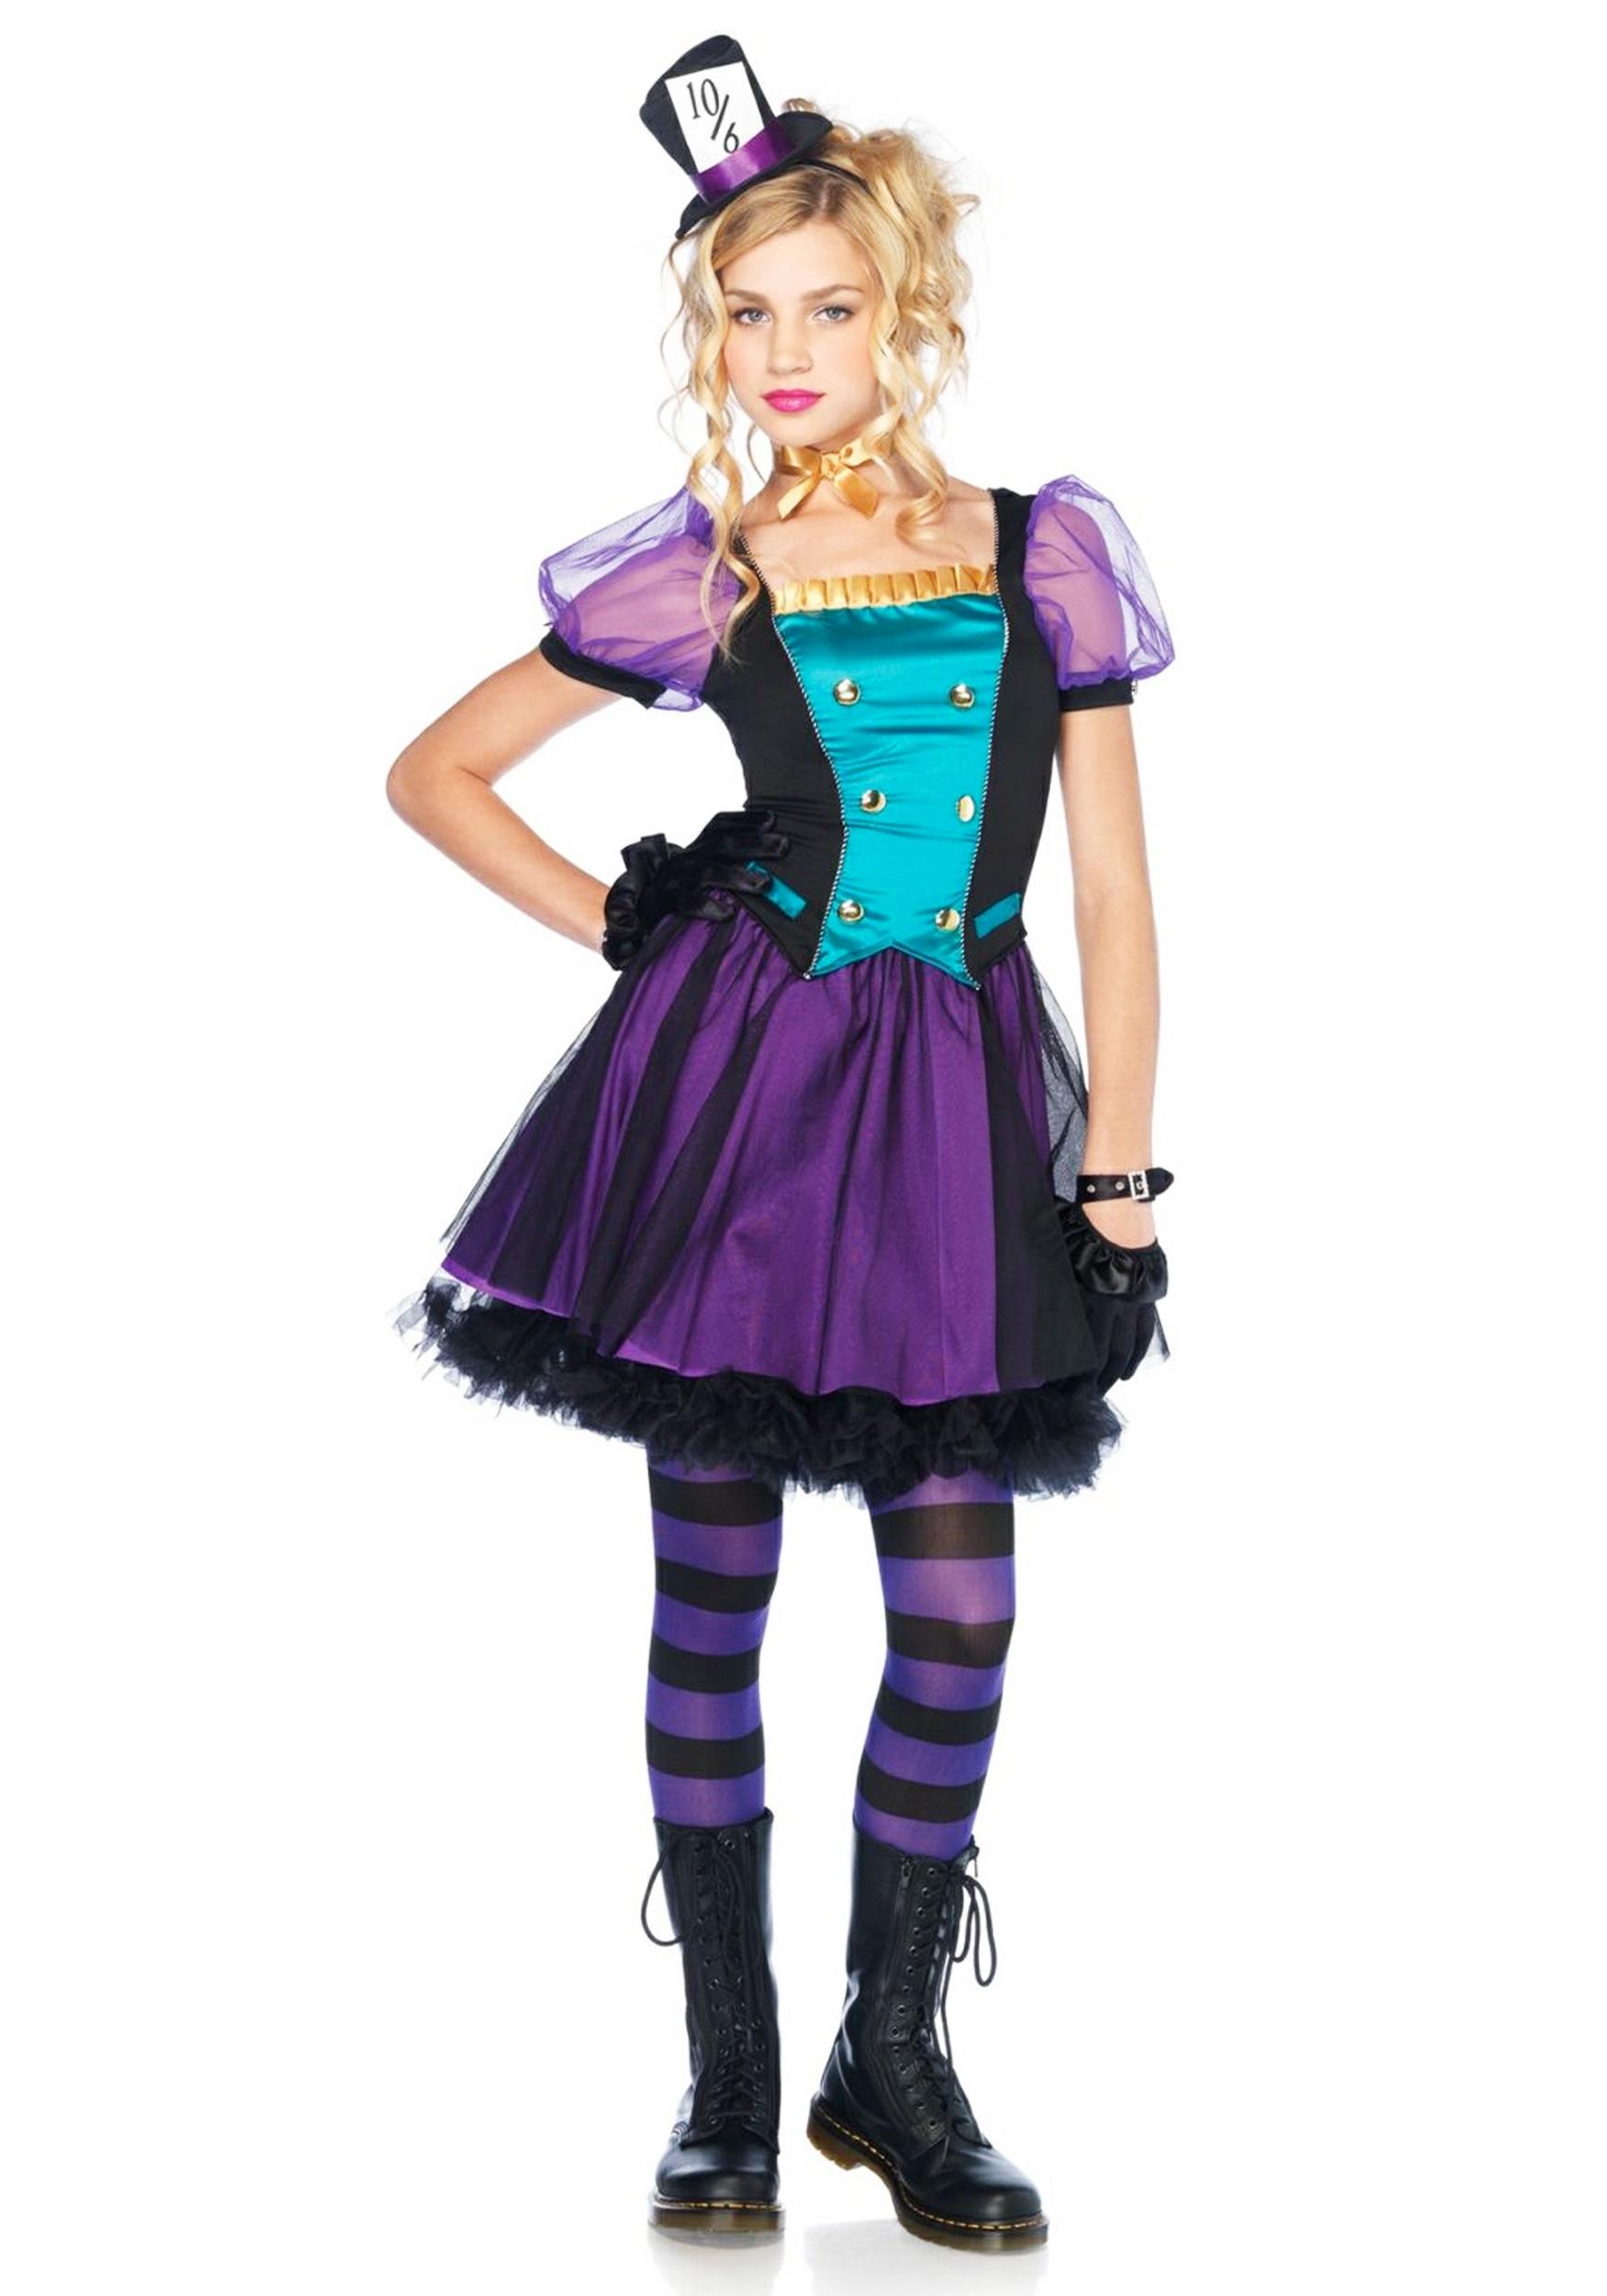 The Mad Hatter Tween Costume Cozy Fresh 9c23e14c21fa Centreforpublicsafety Com